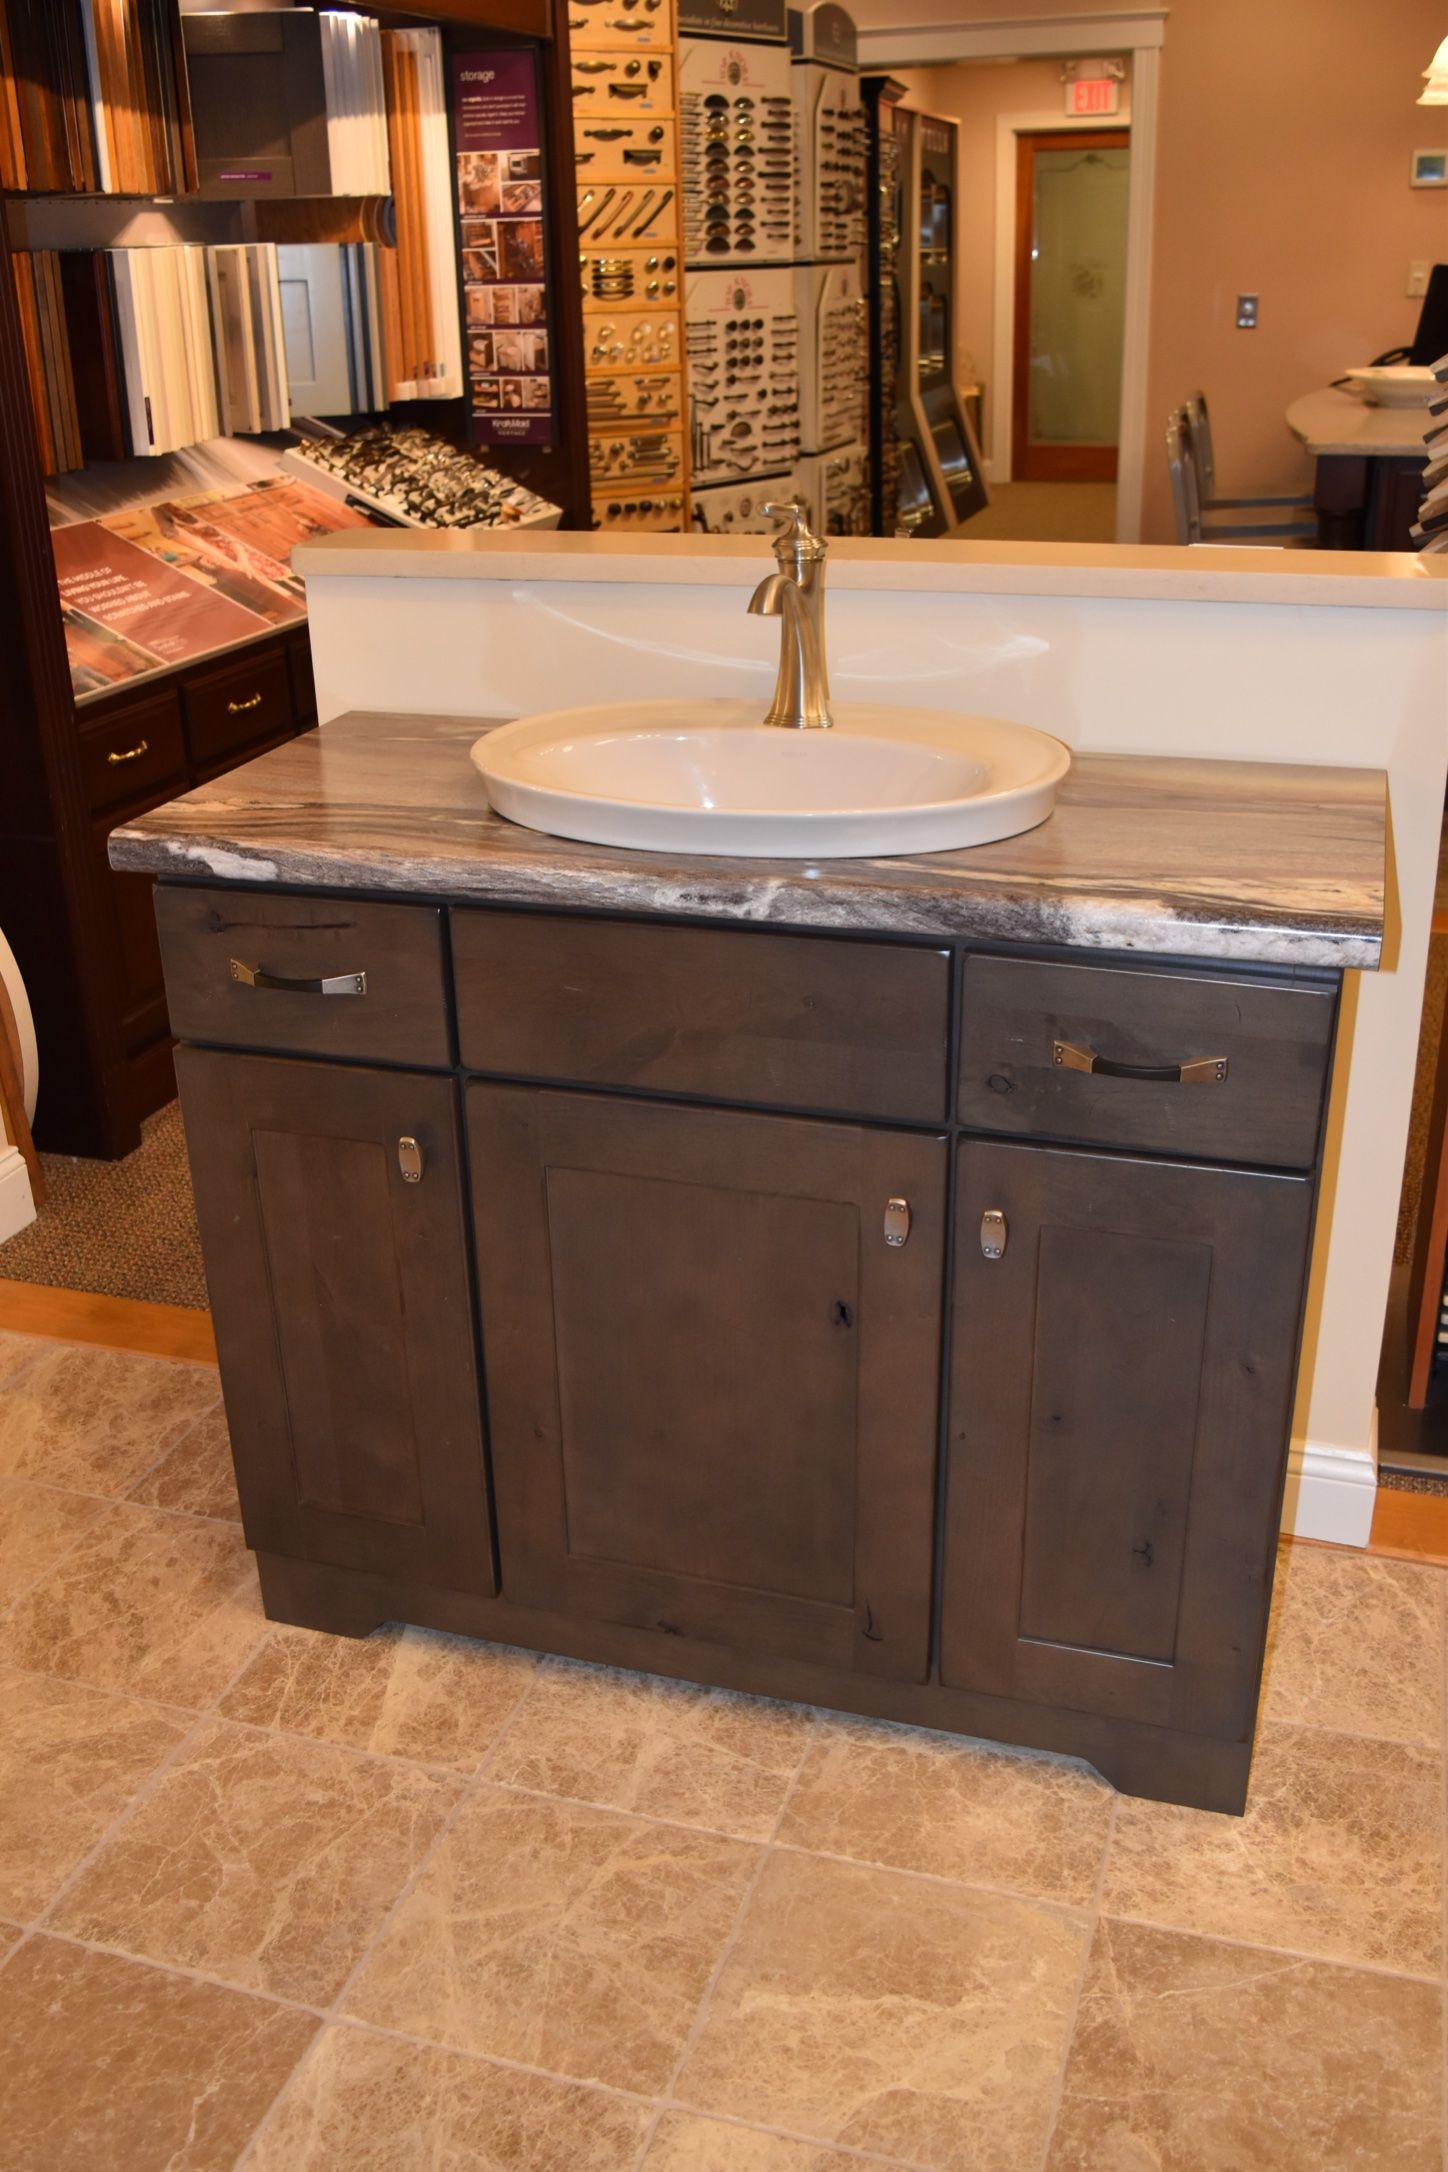 Kraftmaid Putnam Alder Vanity Cabinet In Distressed Canon Gray Kitchen Cabinets In Bathroom Kitchen And Bath Showroom Kitchen Bathroom Remodel